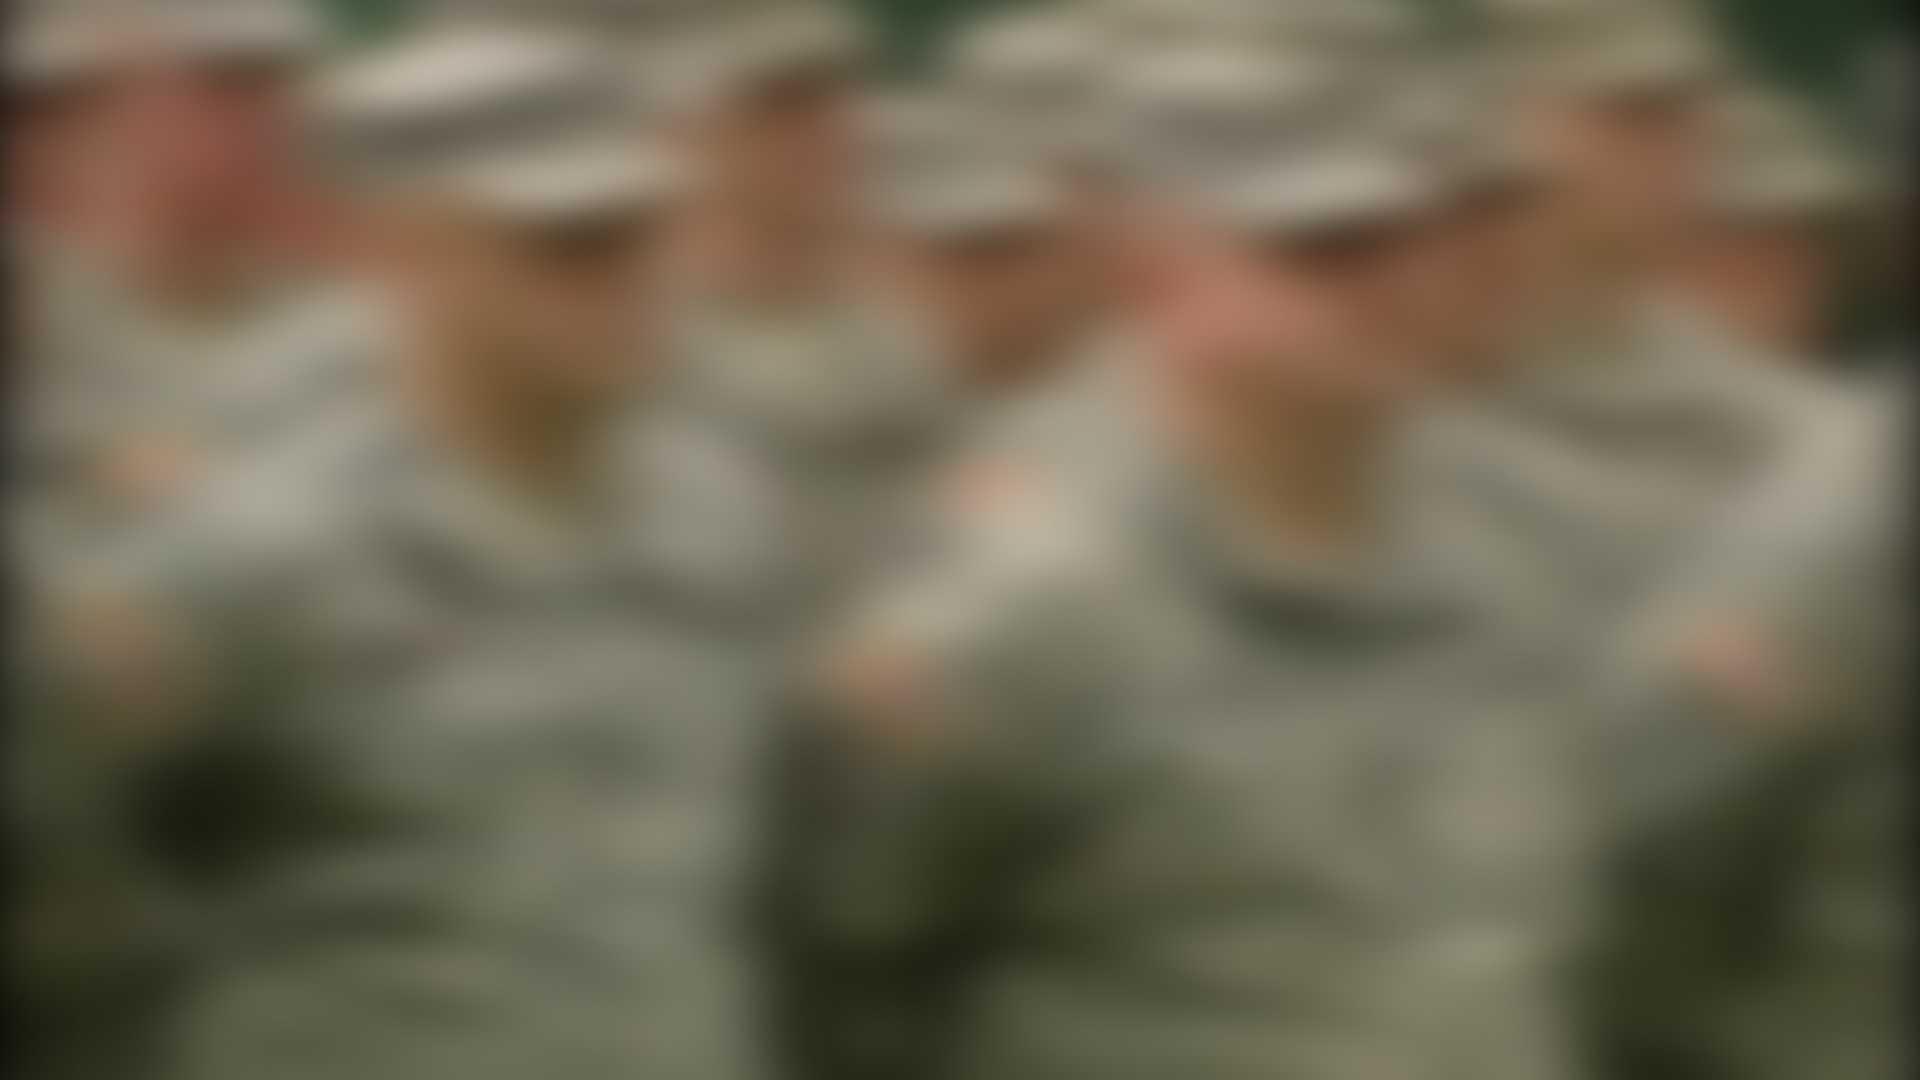 1-30-14 Guard reports 6 sex assaults last year - img